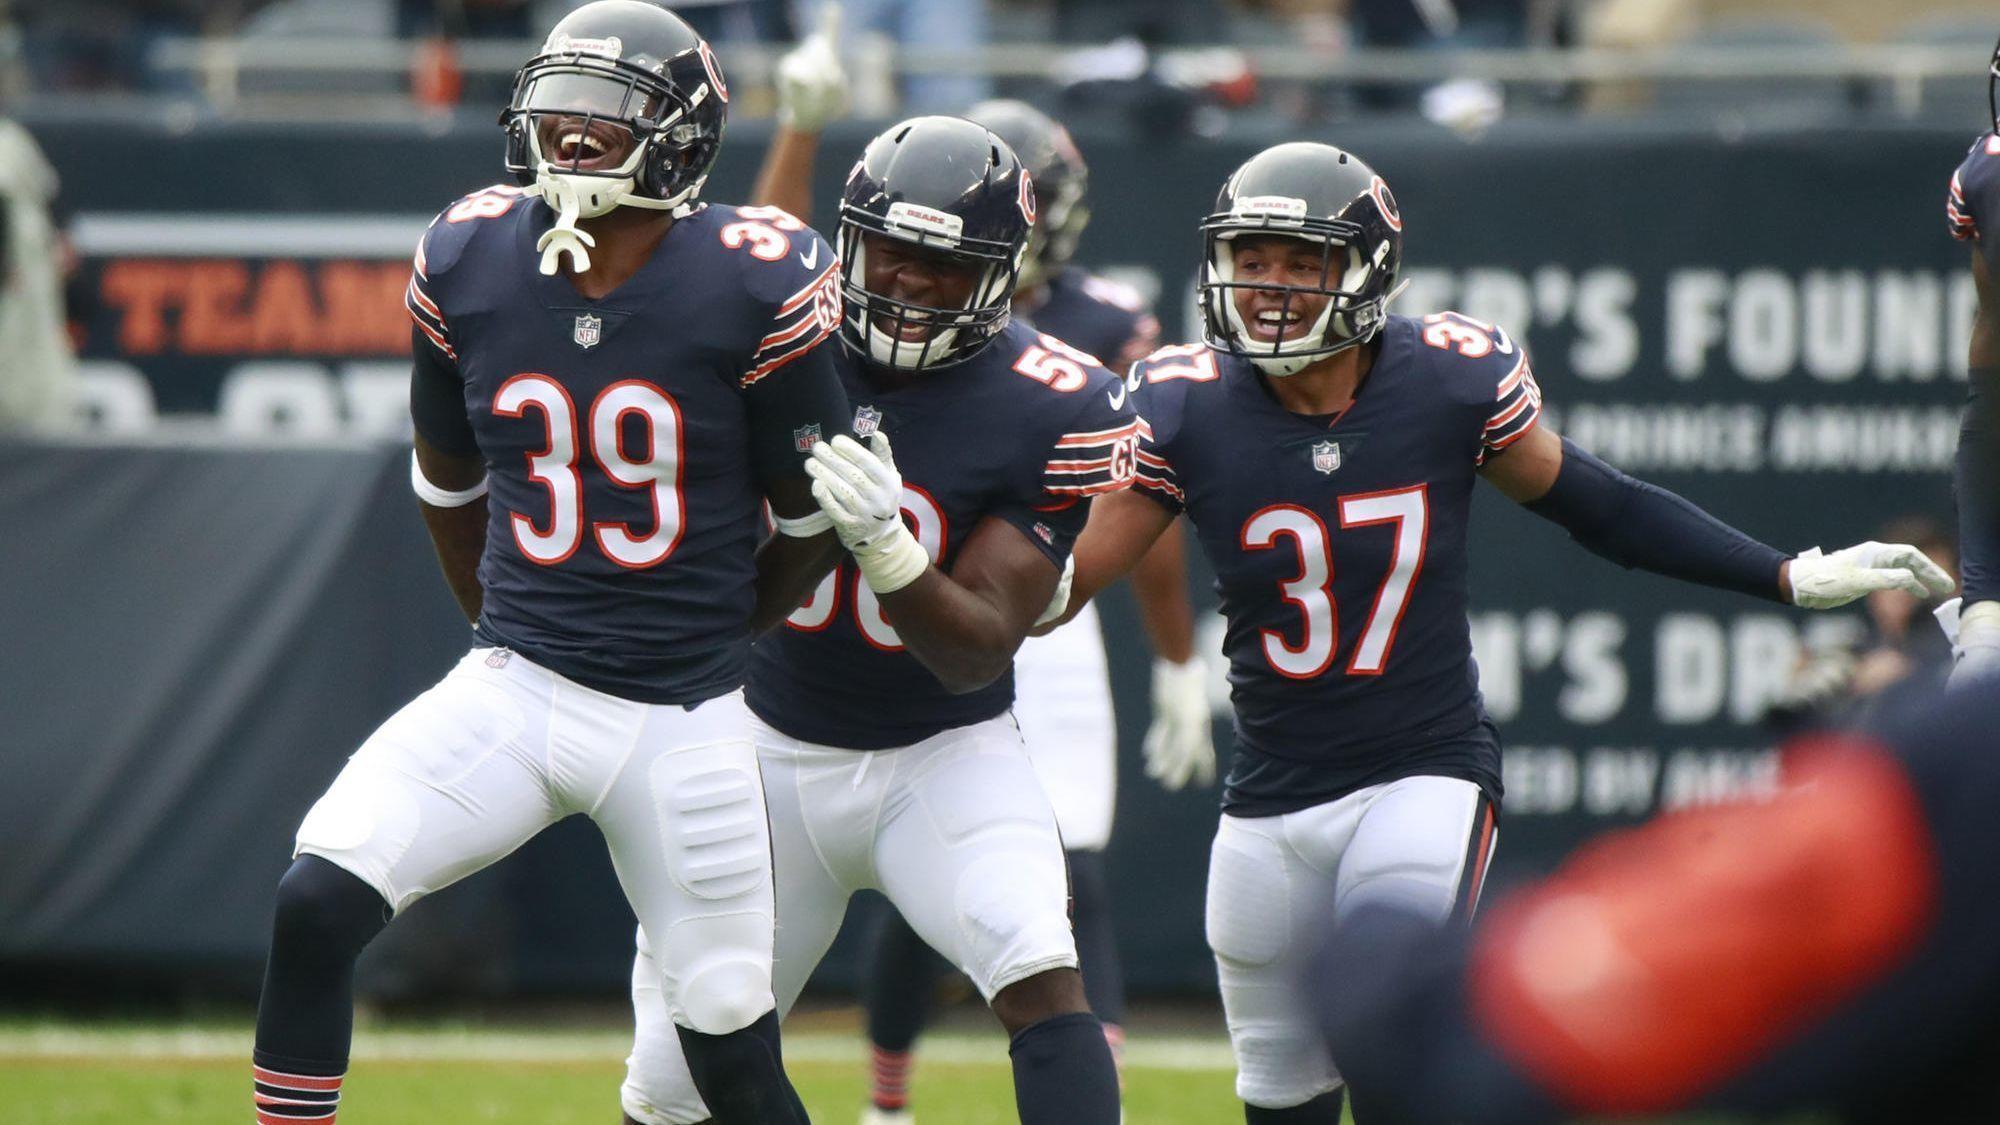 Ct-spt-bears-buccaneers-defense-20180930